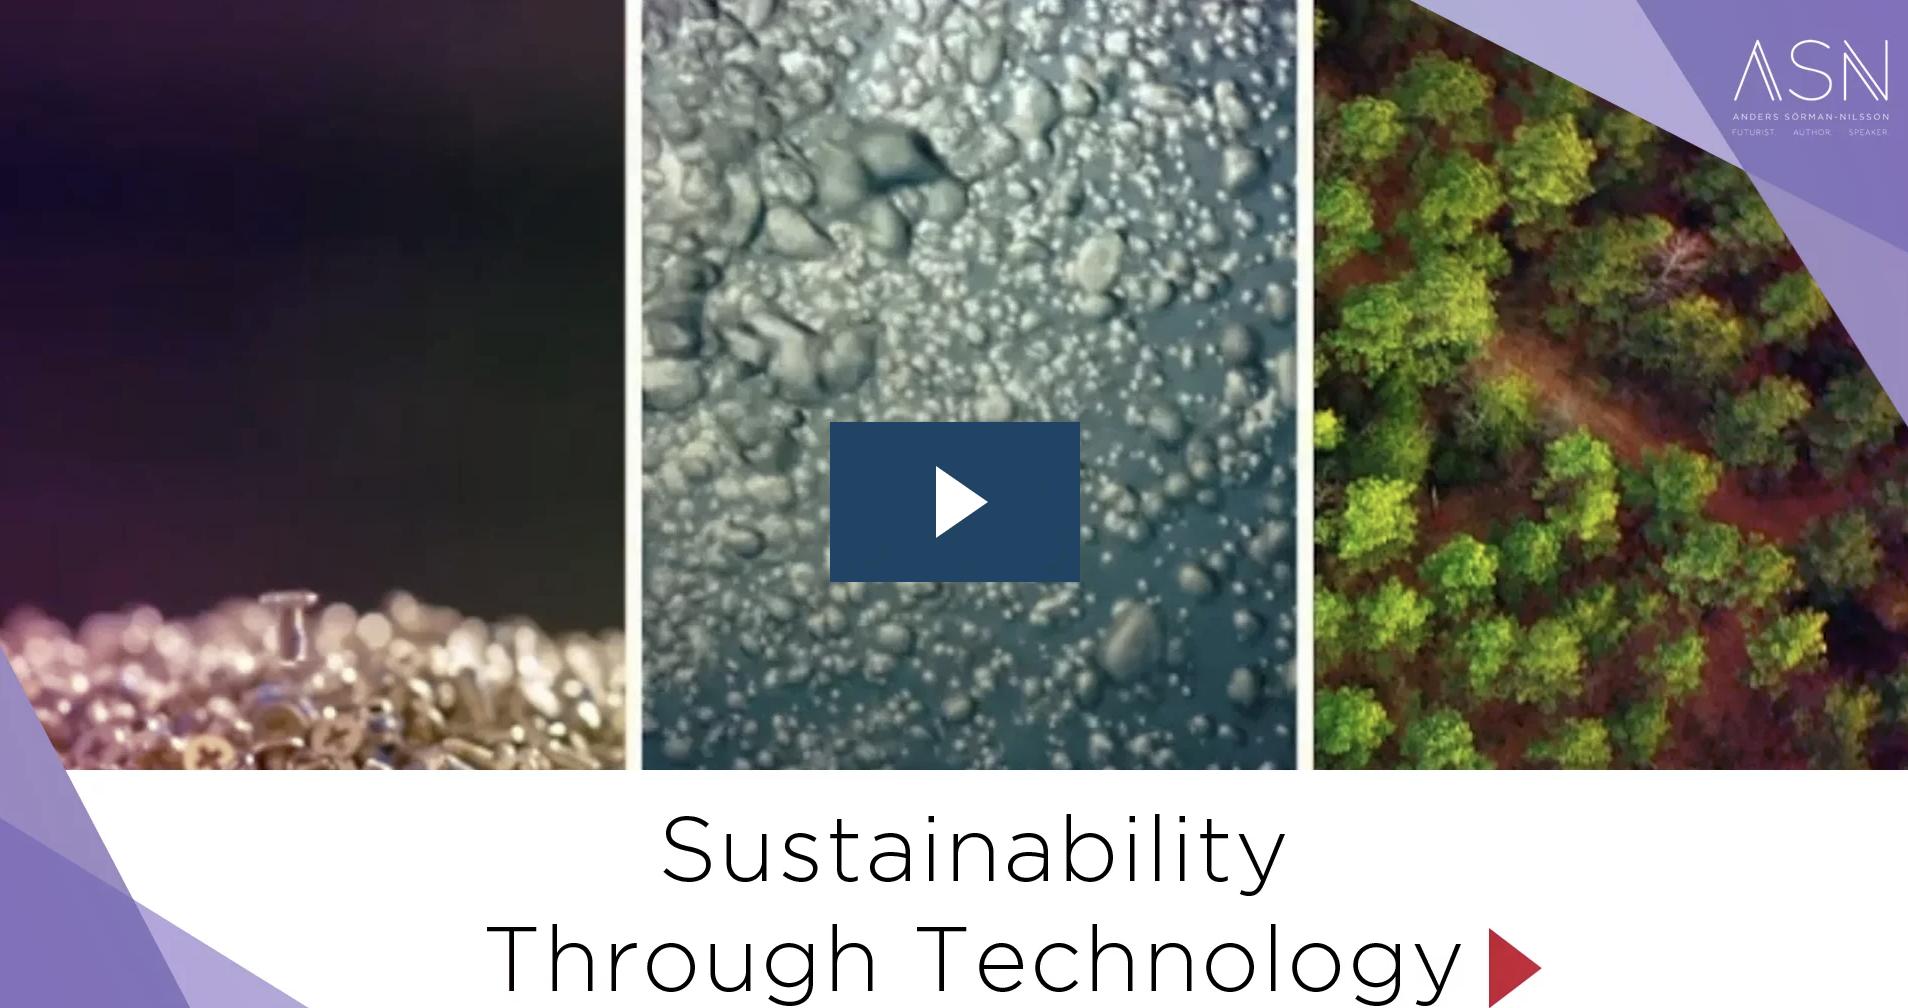 Sustainable Futures Futurist Anders Sorman-Nilsson